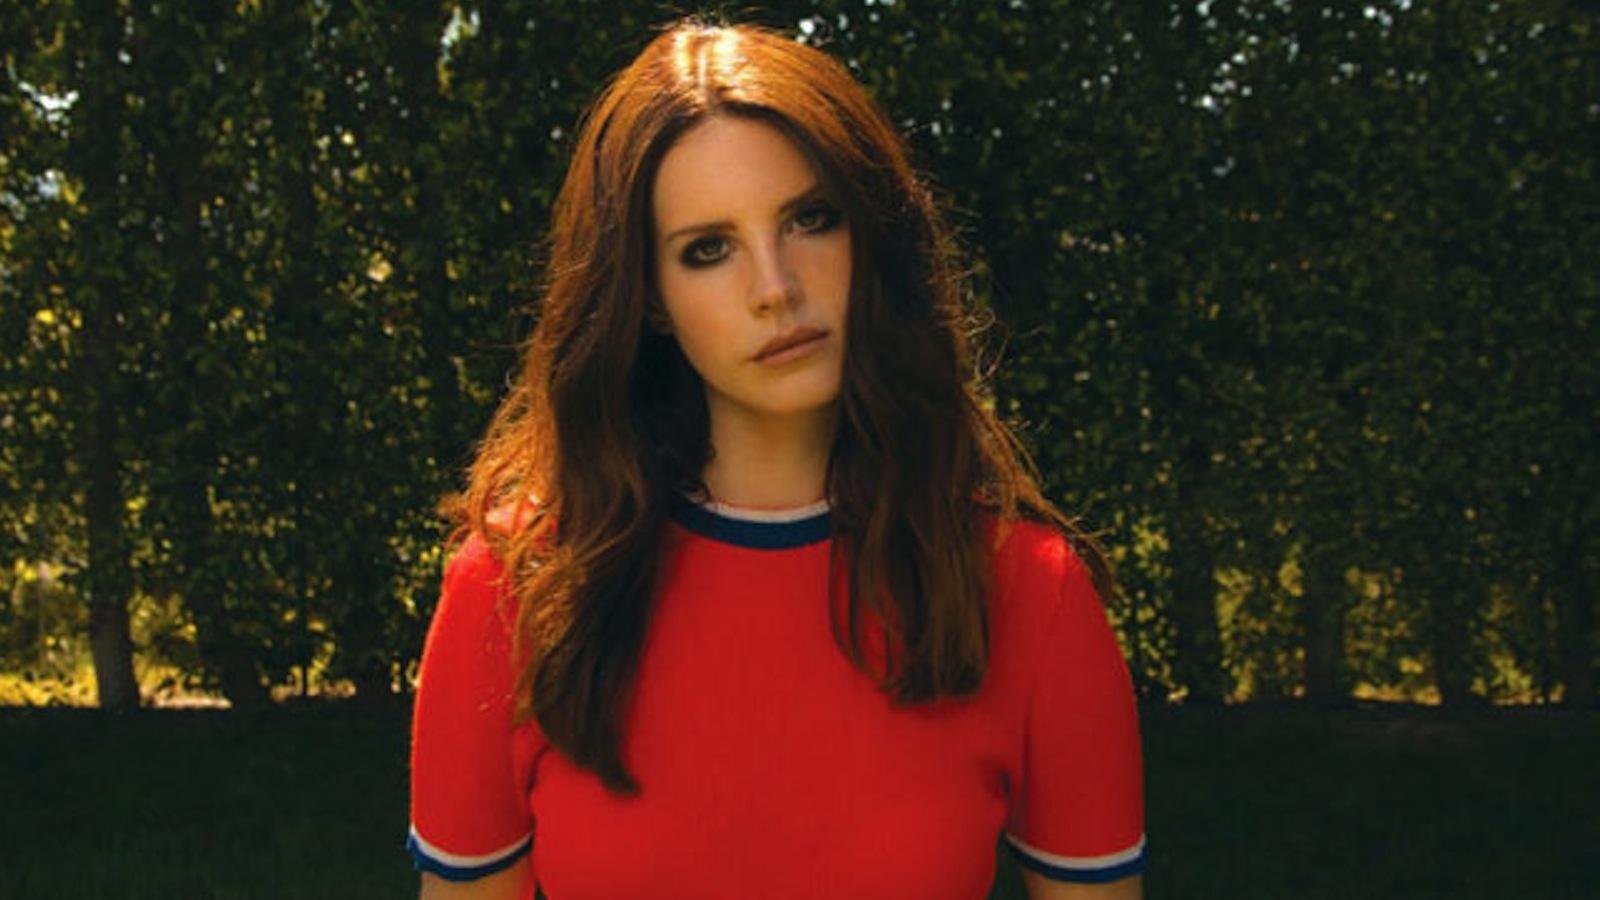 Lana Del Rey Isnt Anti Feminist Shed Just Rather Focus